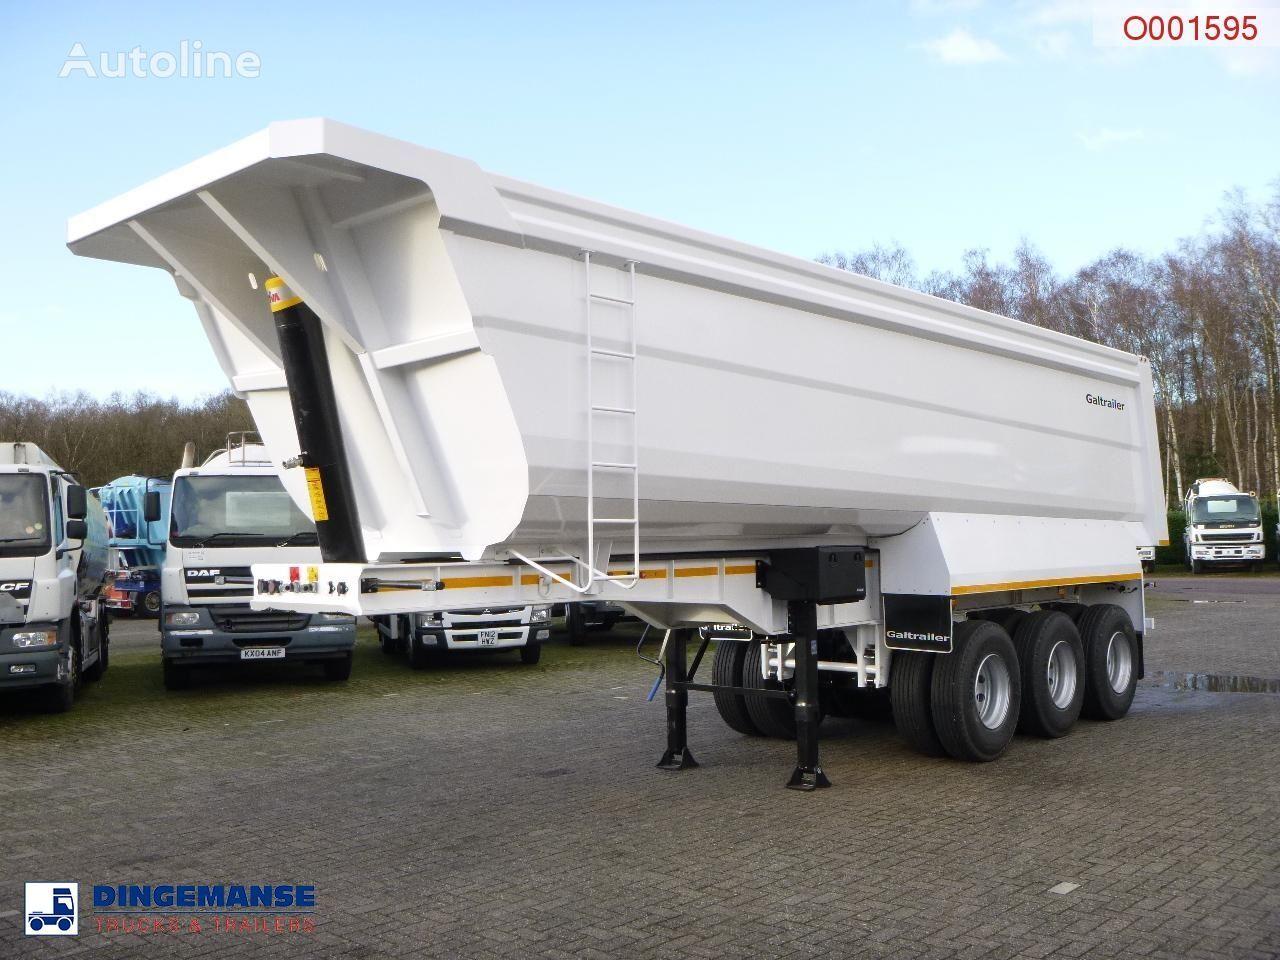 new Galtrailer Tipper trailer steel 40 m3 / 68 T / steel susp. / NEW/UNUSED tipper semi-trailer